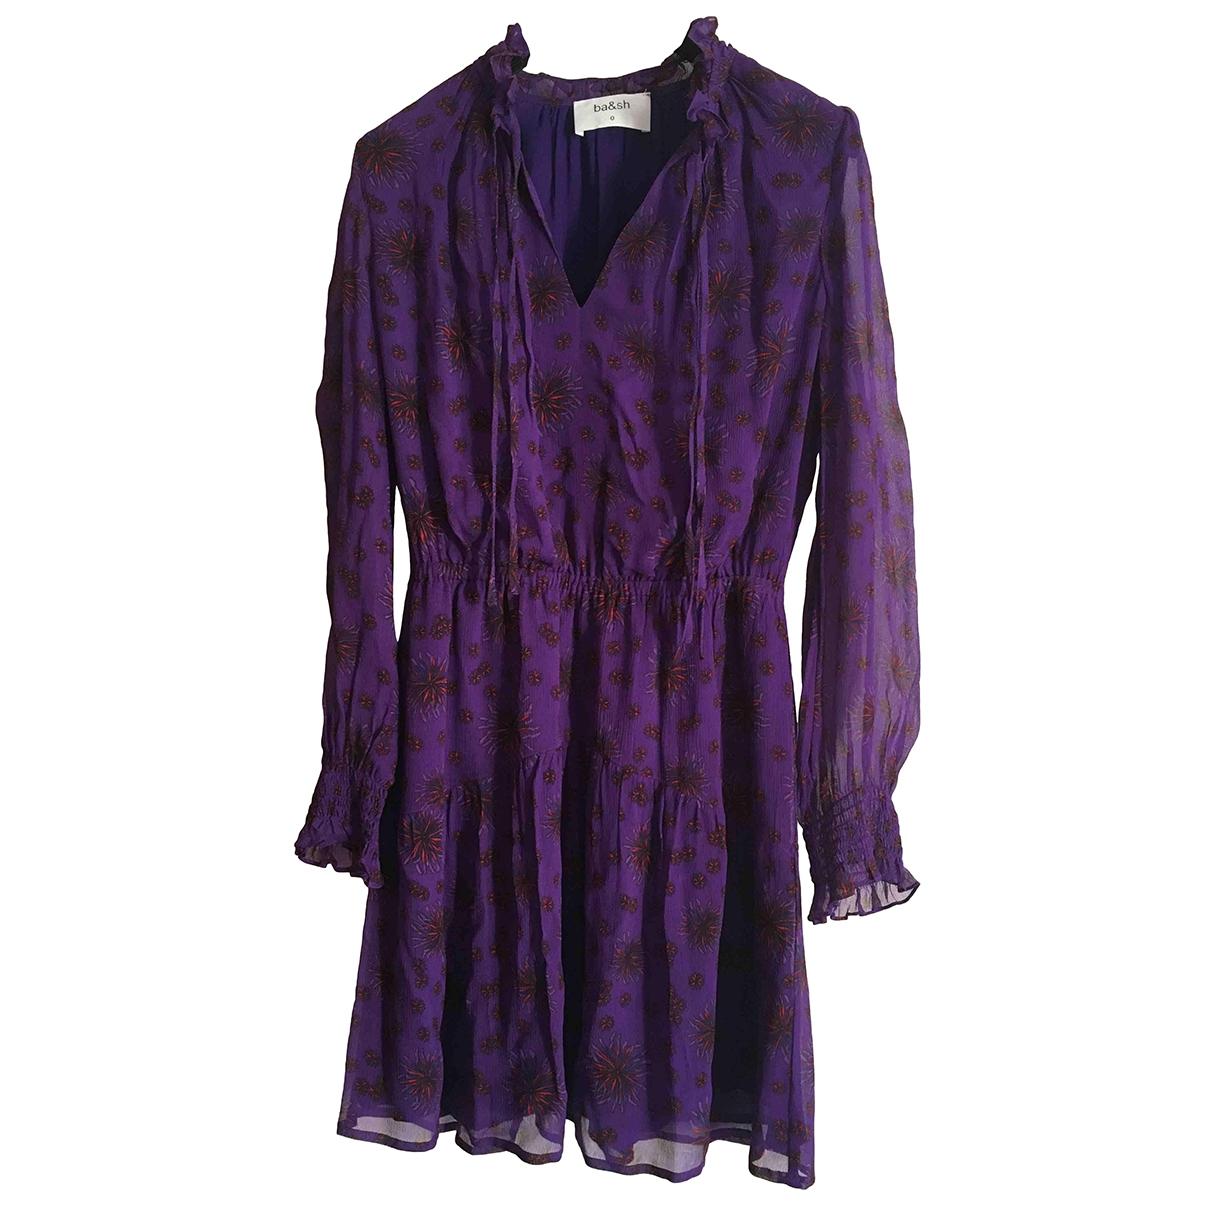 Ba&sh Spring Summer 2019 Purple dress for Women 34 FR